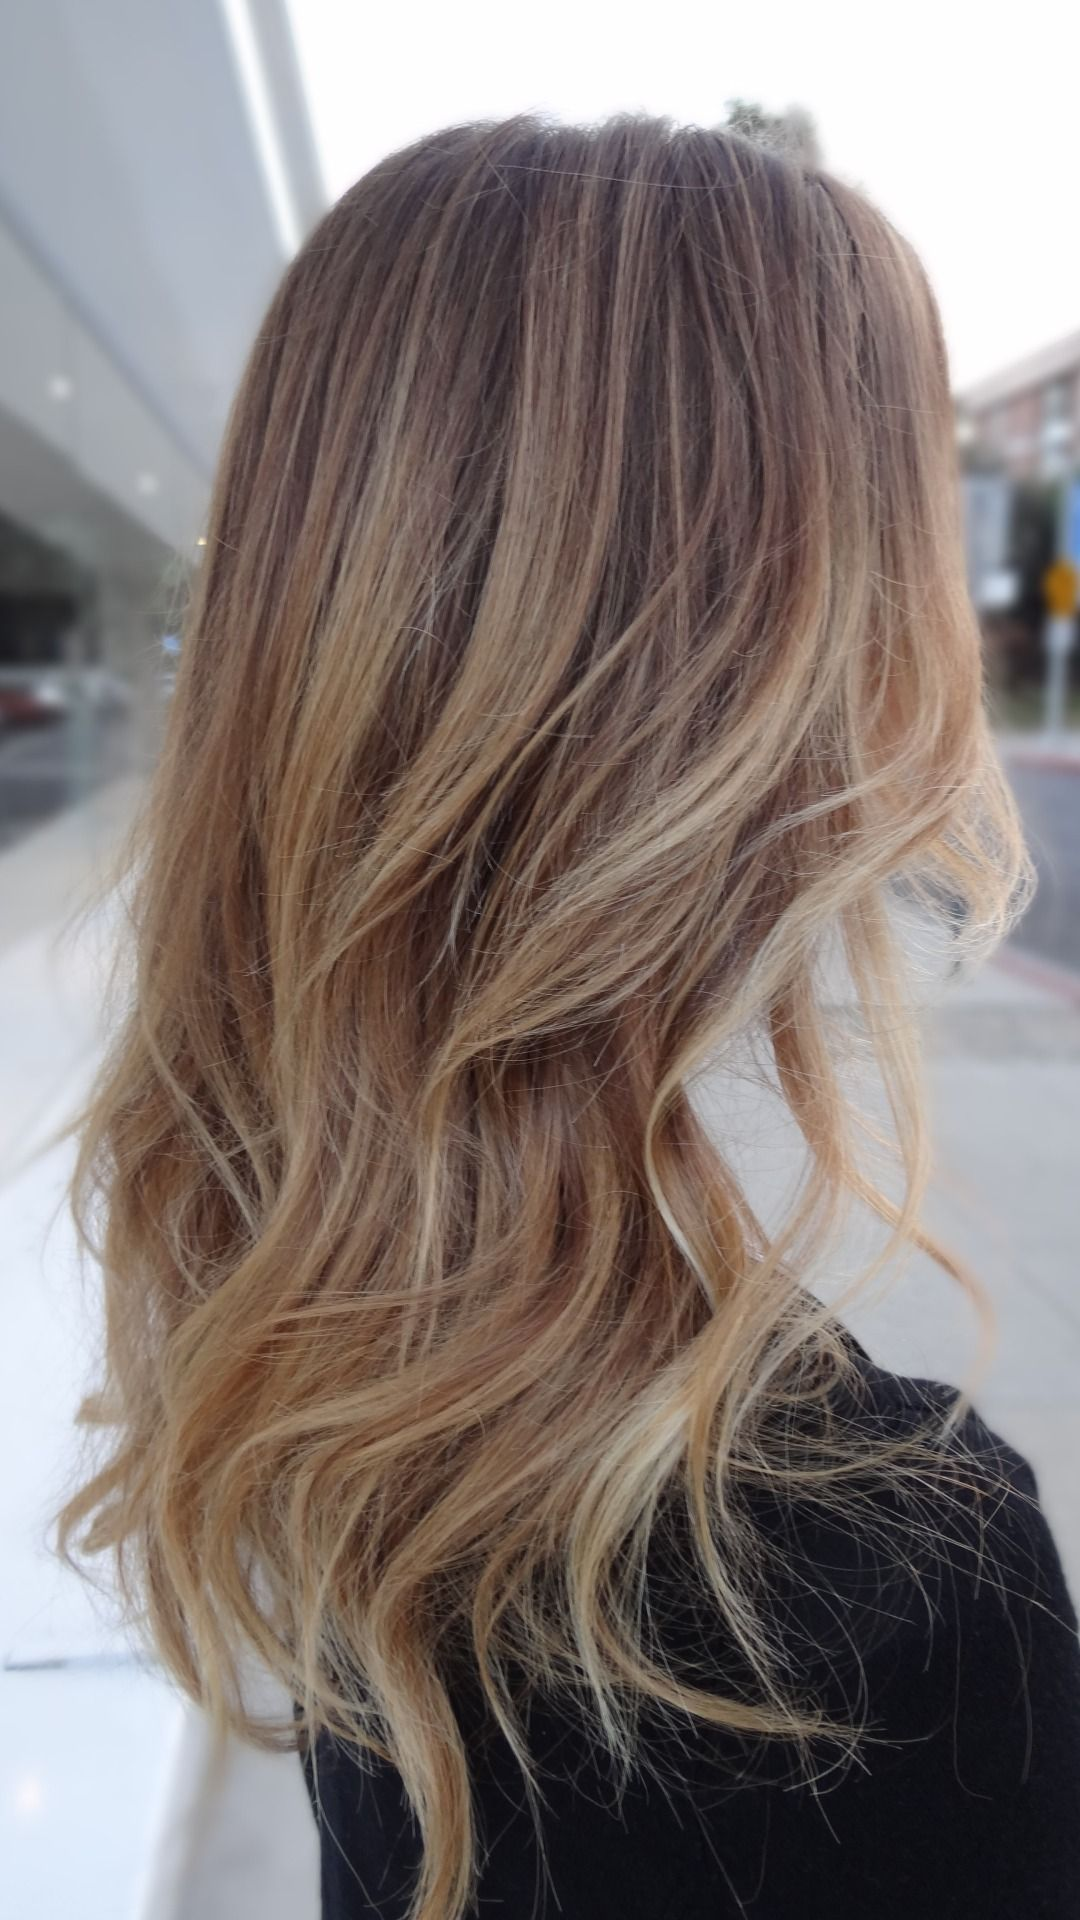 SANDY BEACHY BLONDE HAIR COLOR BY SARAH CONNER | Hair ...